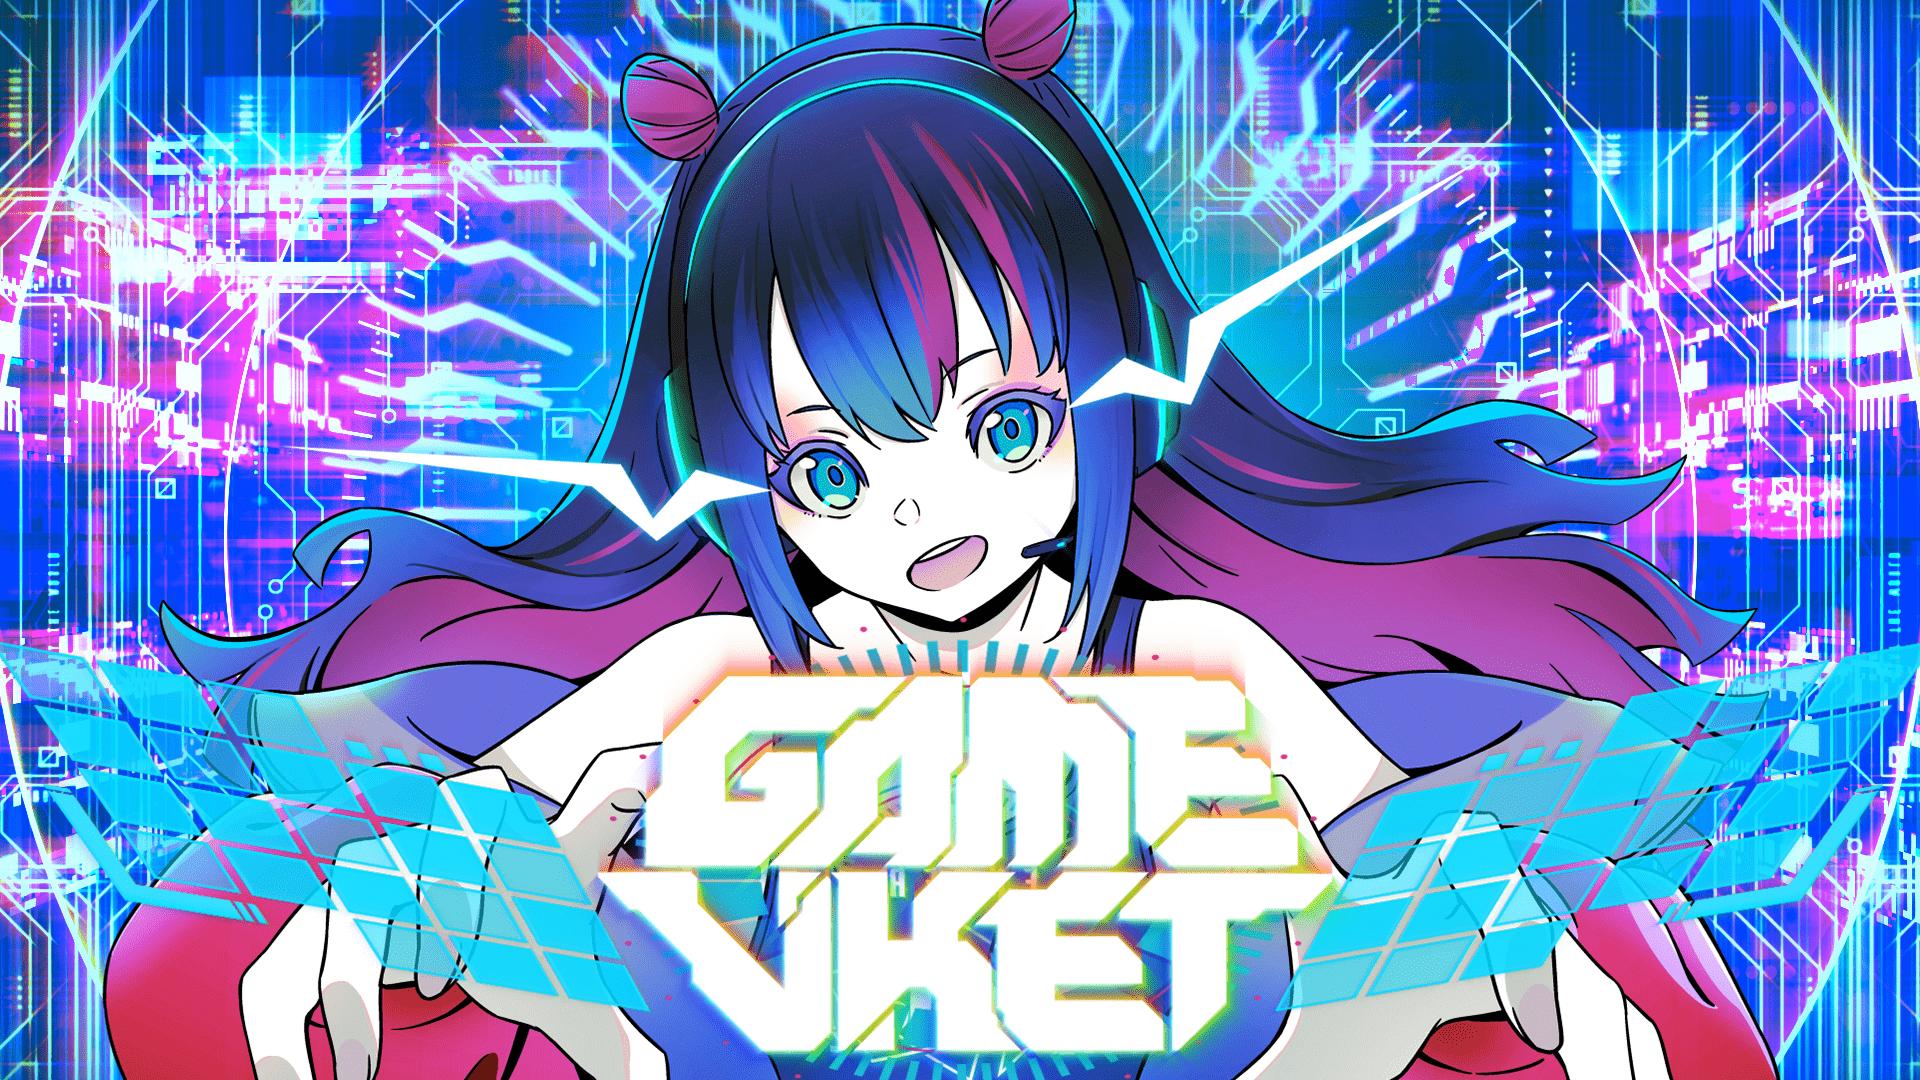 GameVketZero – งานแสดงเกมอินดี้ในแบบ VR [NEWS]